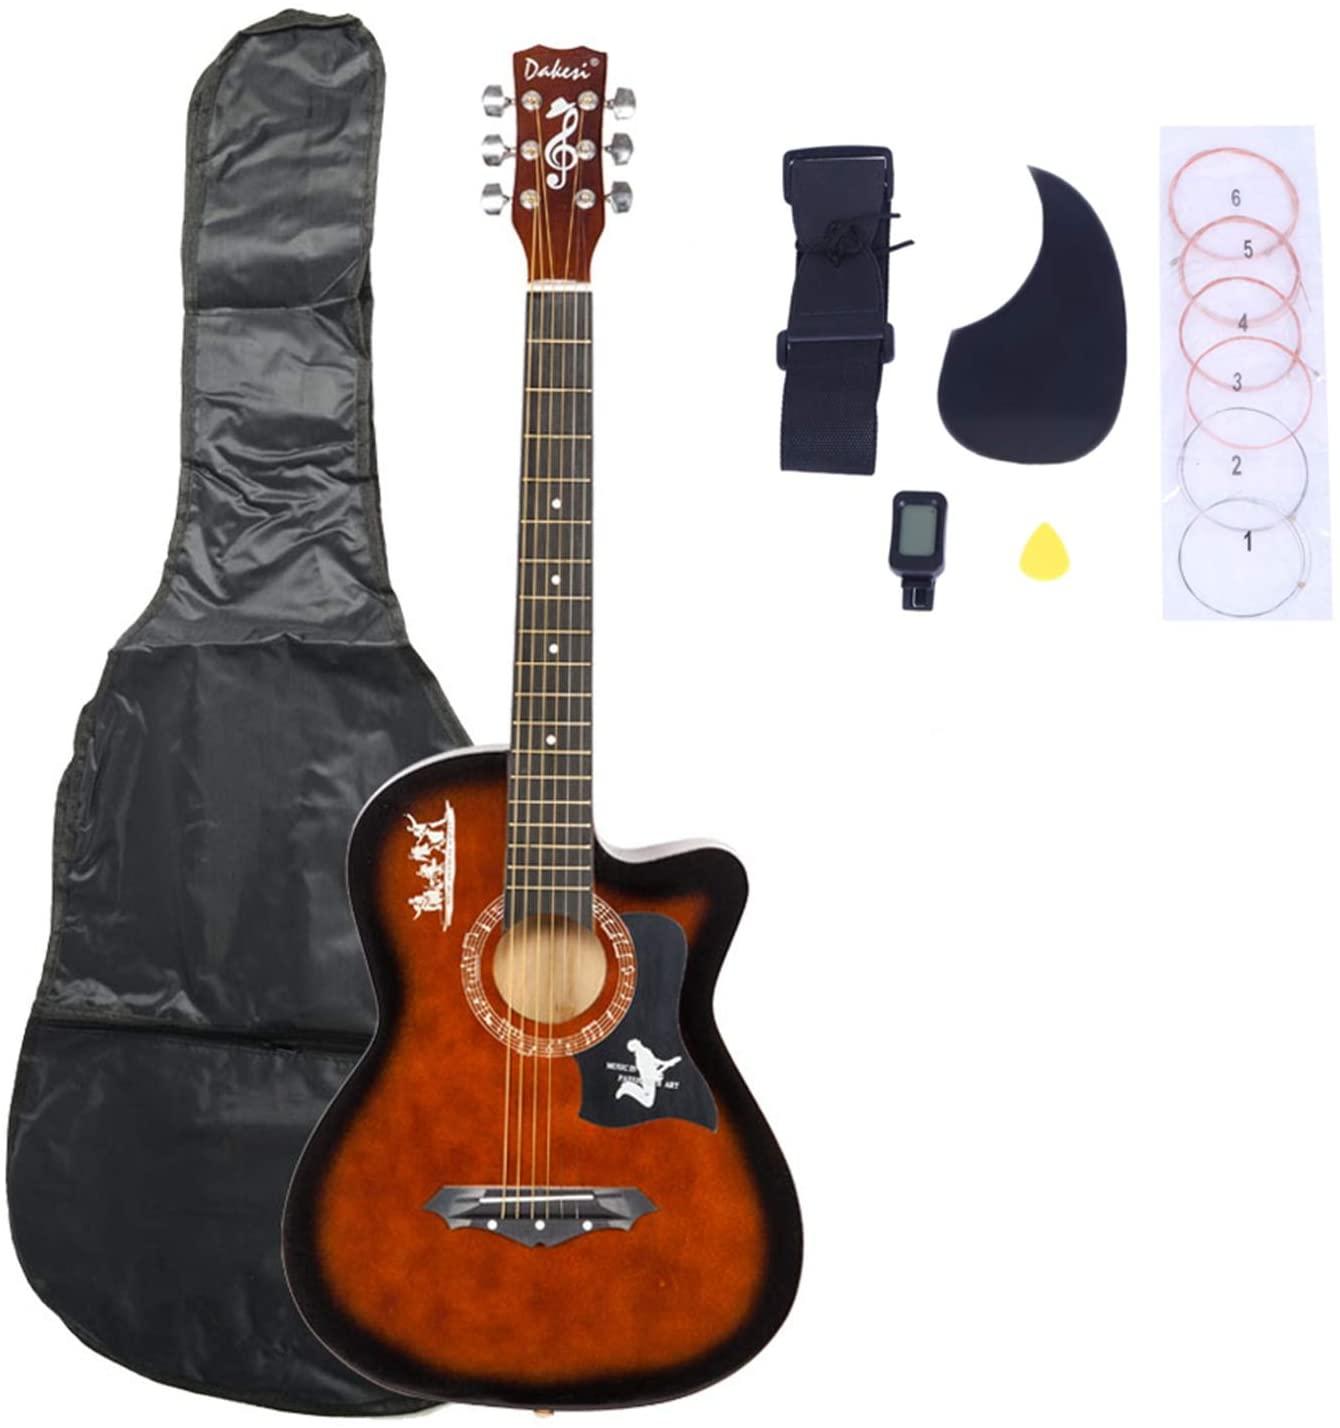 DK-38C Basswood Guitar Bag, Straps, Picks, LCD Tuner, Pickguard, String Set Coffee - Beginner Guitar Starter Student Guitar